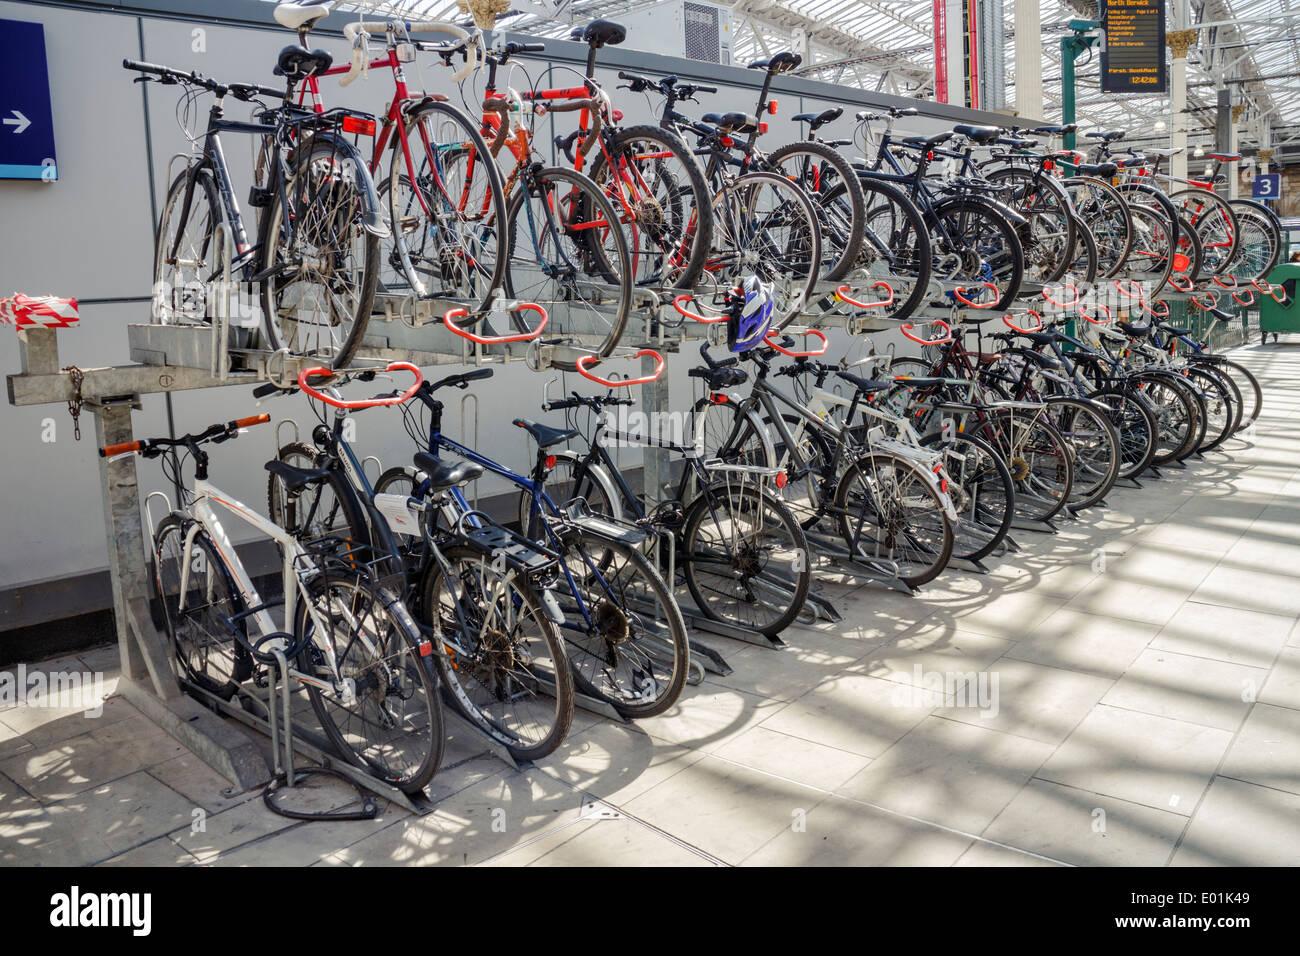 Bicycle rack at Waverley Train Station Edinburgh. - Stock Image